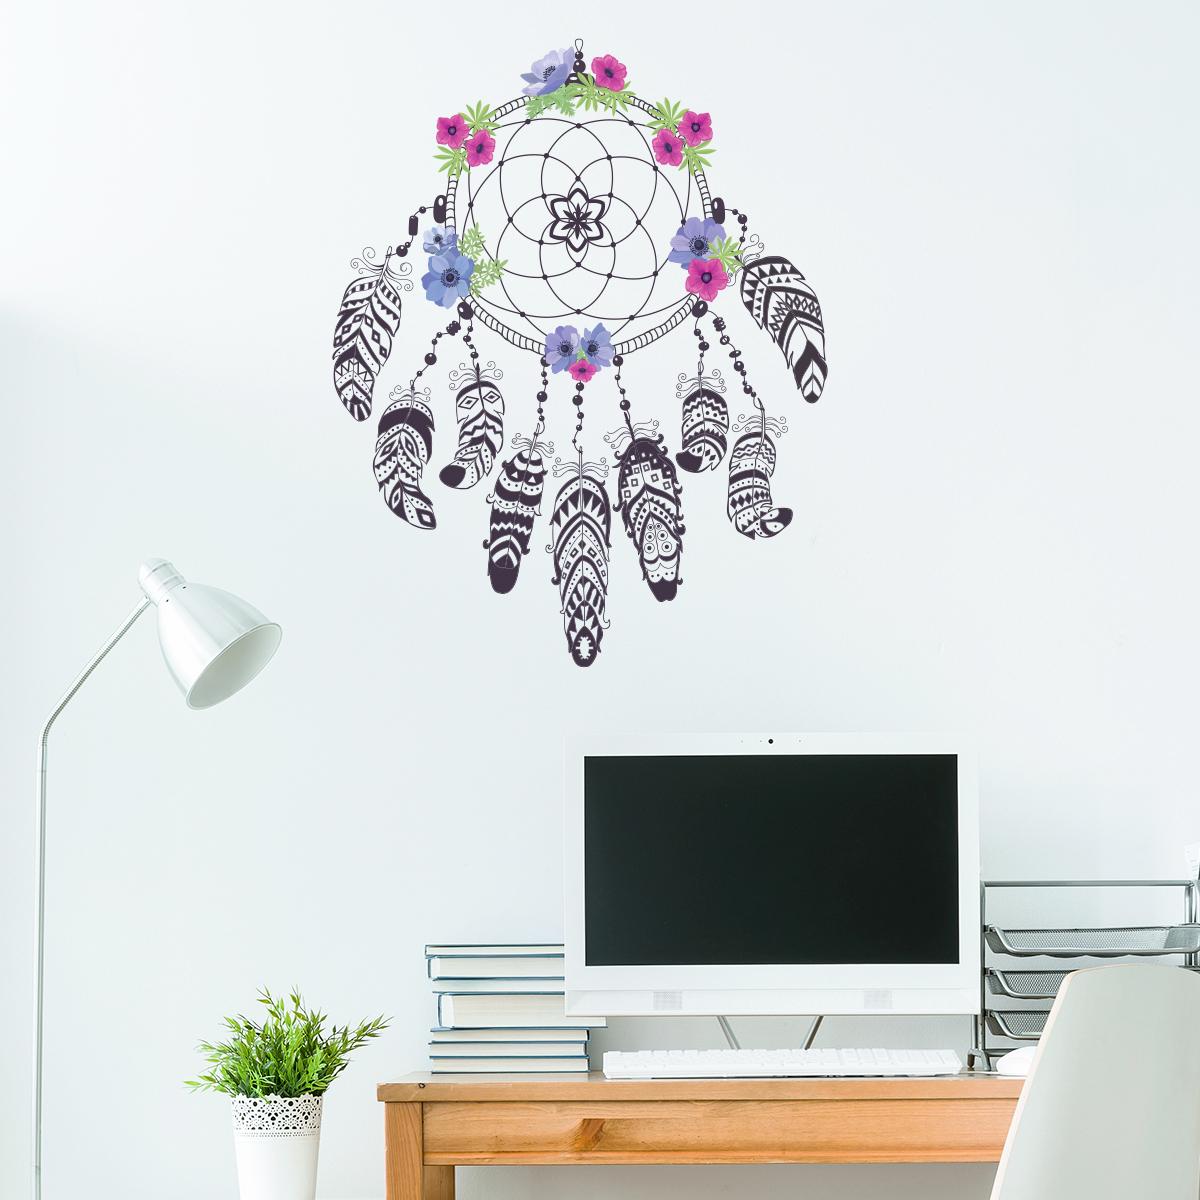 sticker boh me attrape r ves fleurie stickers nature. Black Bedroom Furniture Sets. Home Design Ideas